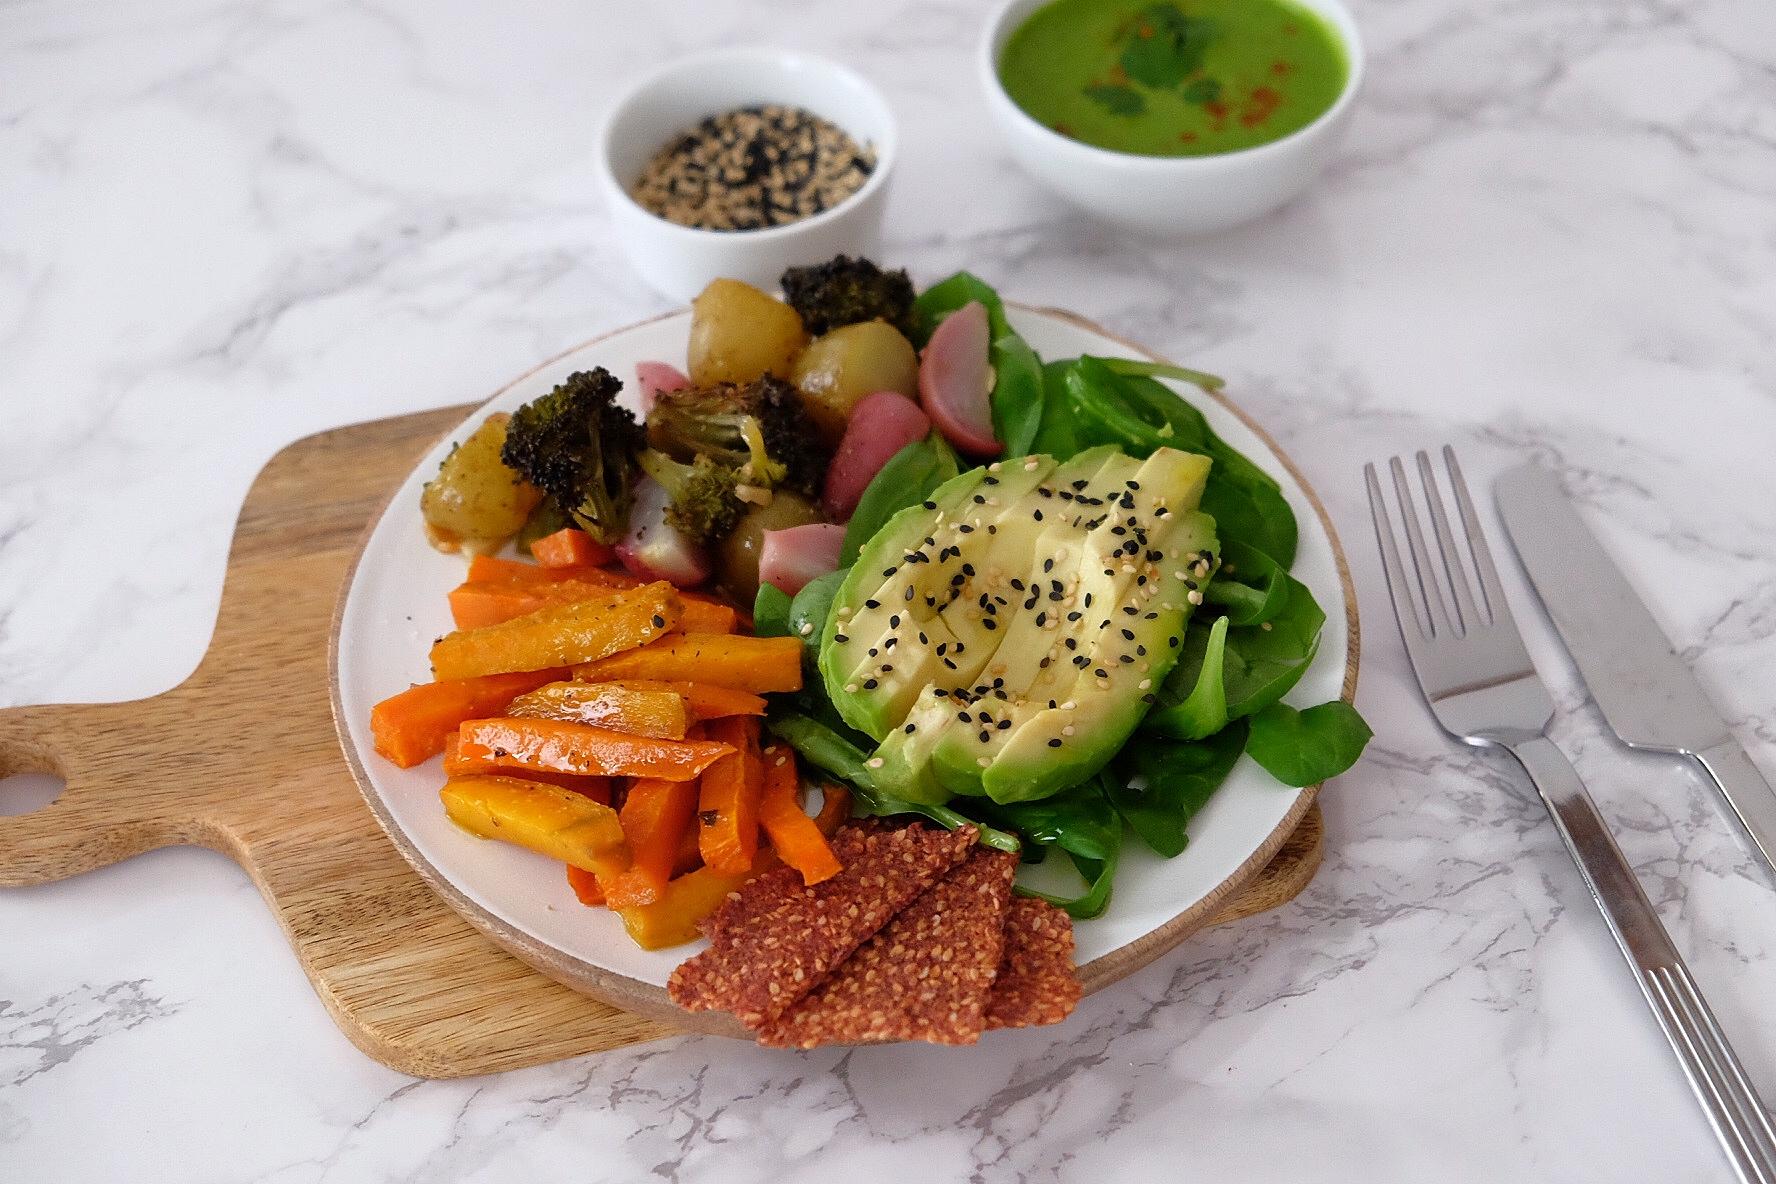 Roasted vegetable salad with green tahini sauce